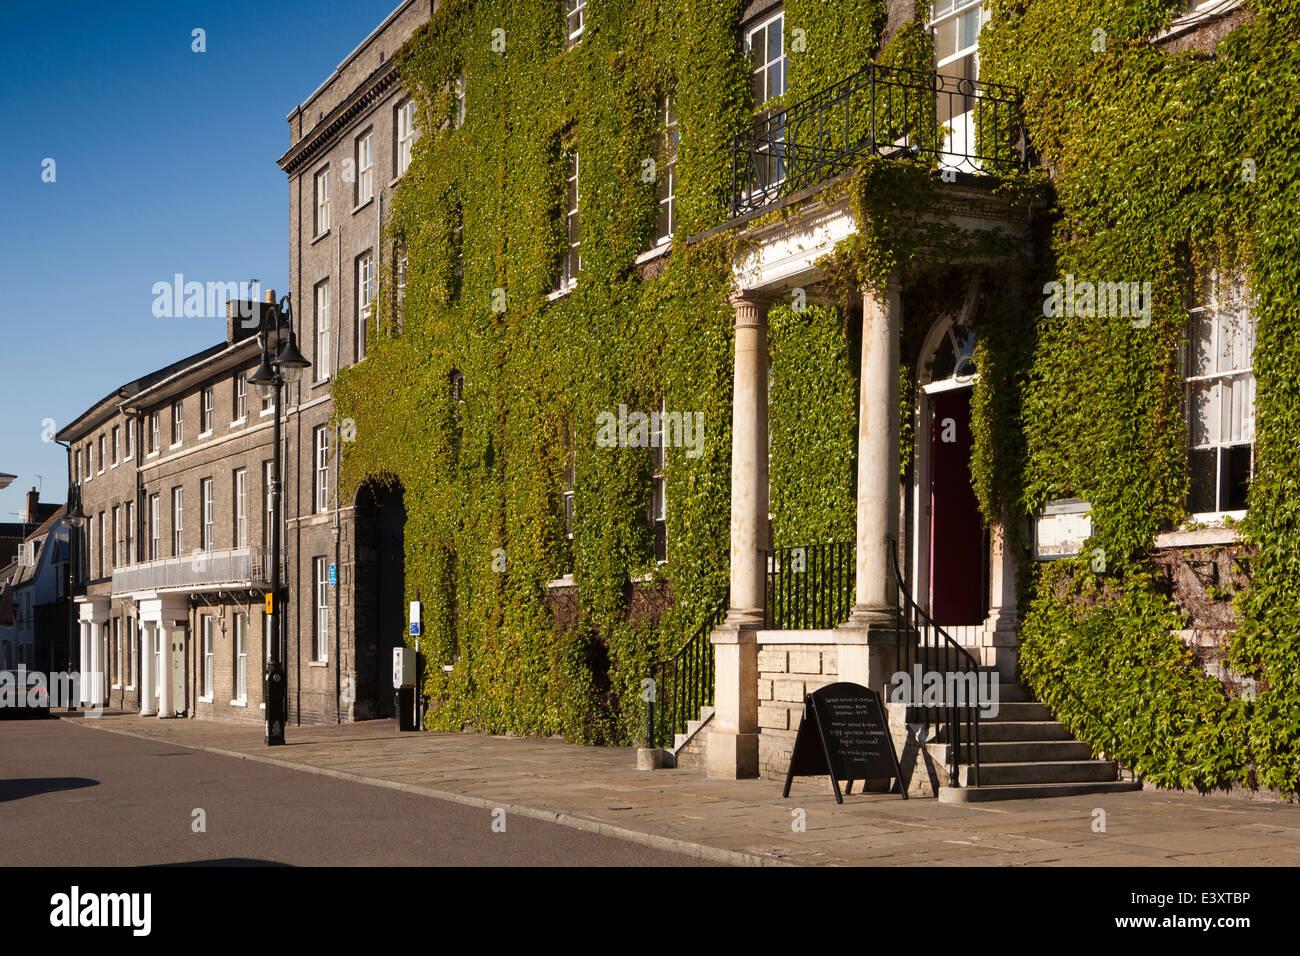 UK England, Suffolk, Bury St Edmunds, Crown Street, Angel Hotel - Stock Image